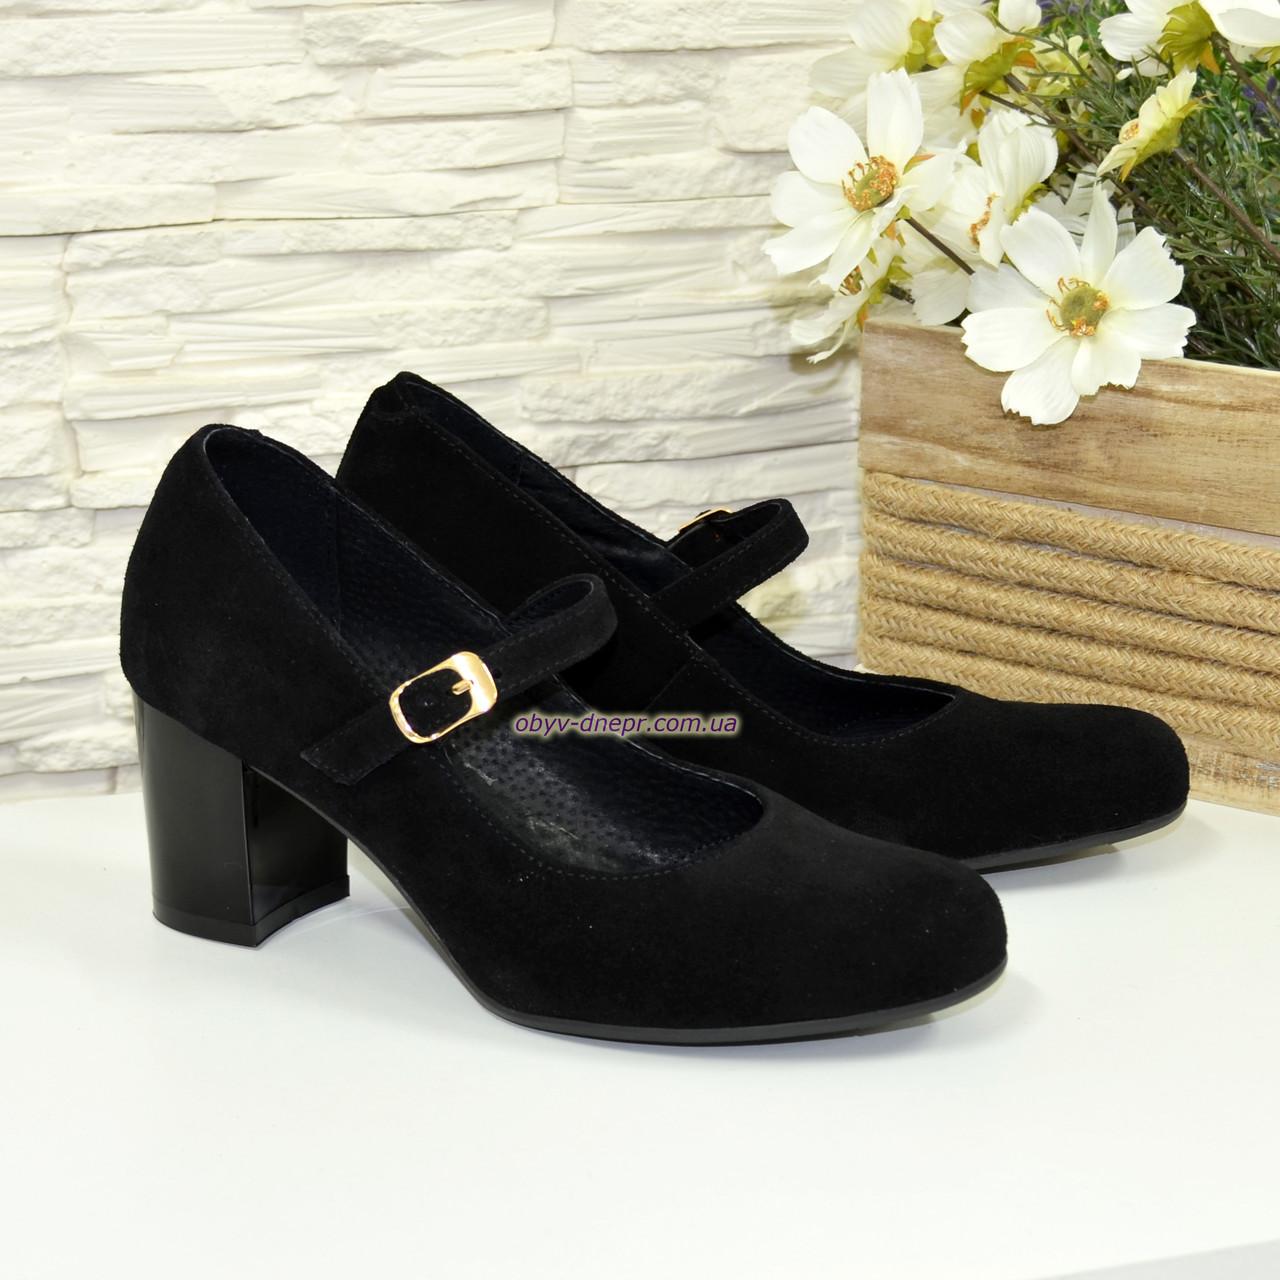 Туфли замшевые женские на устойчивом каблуке